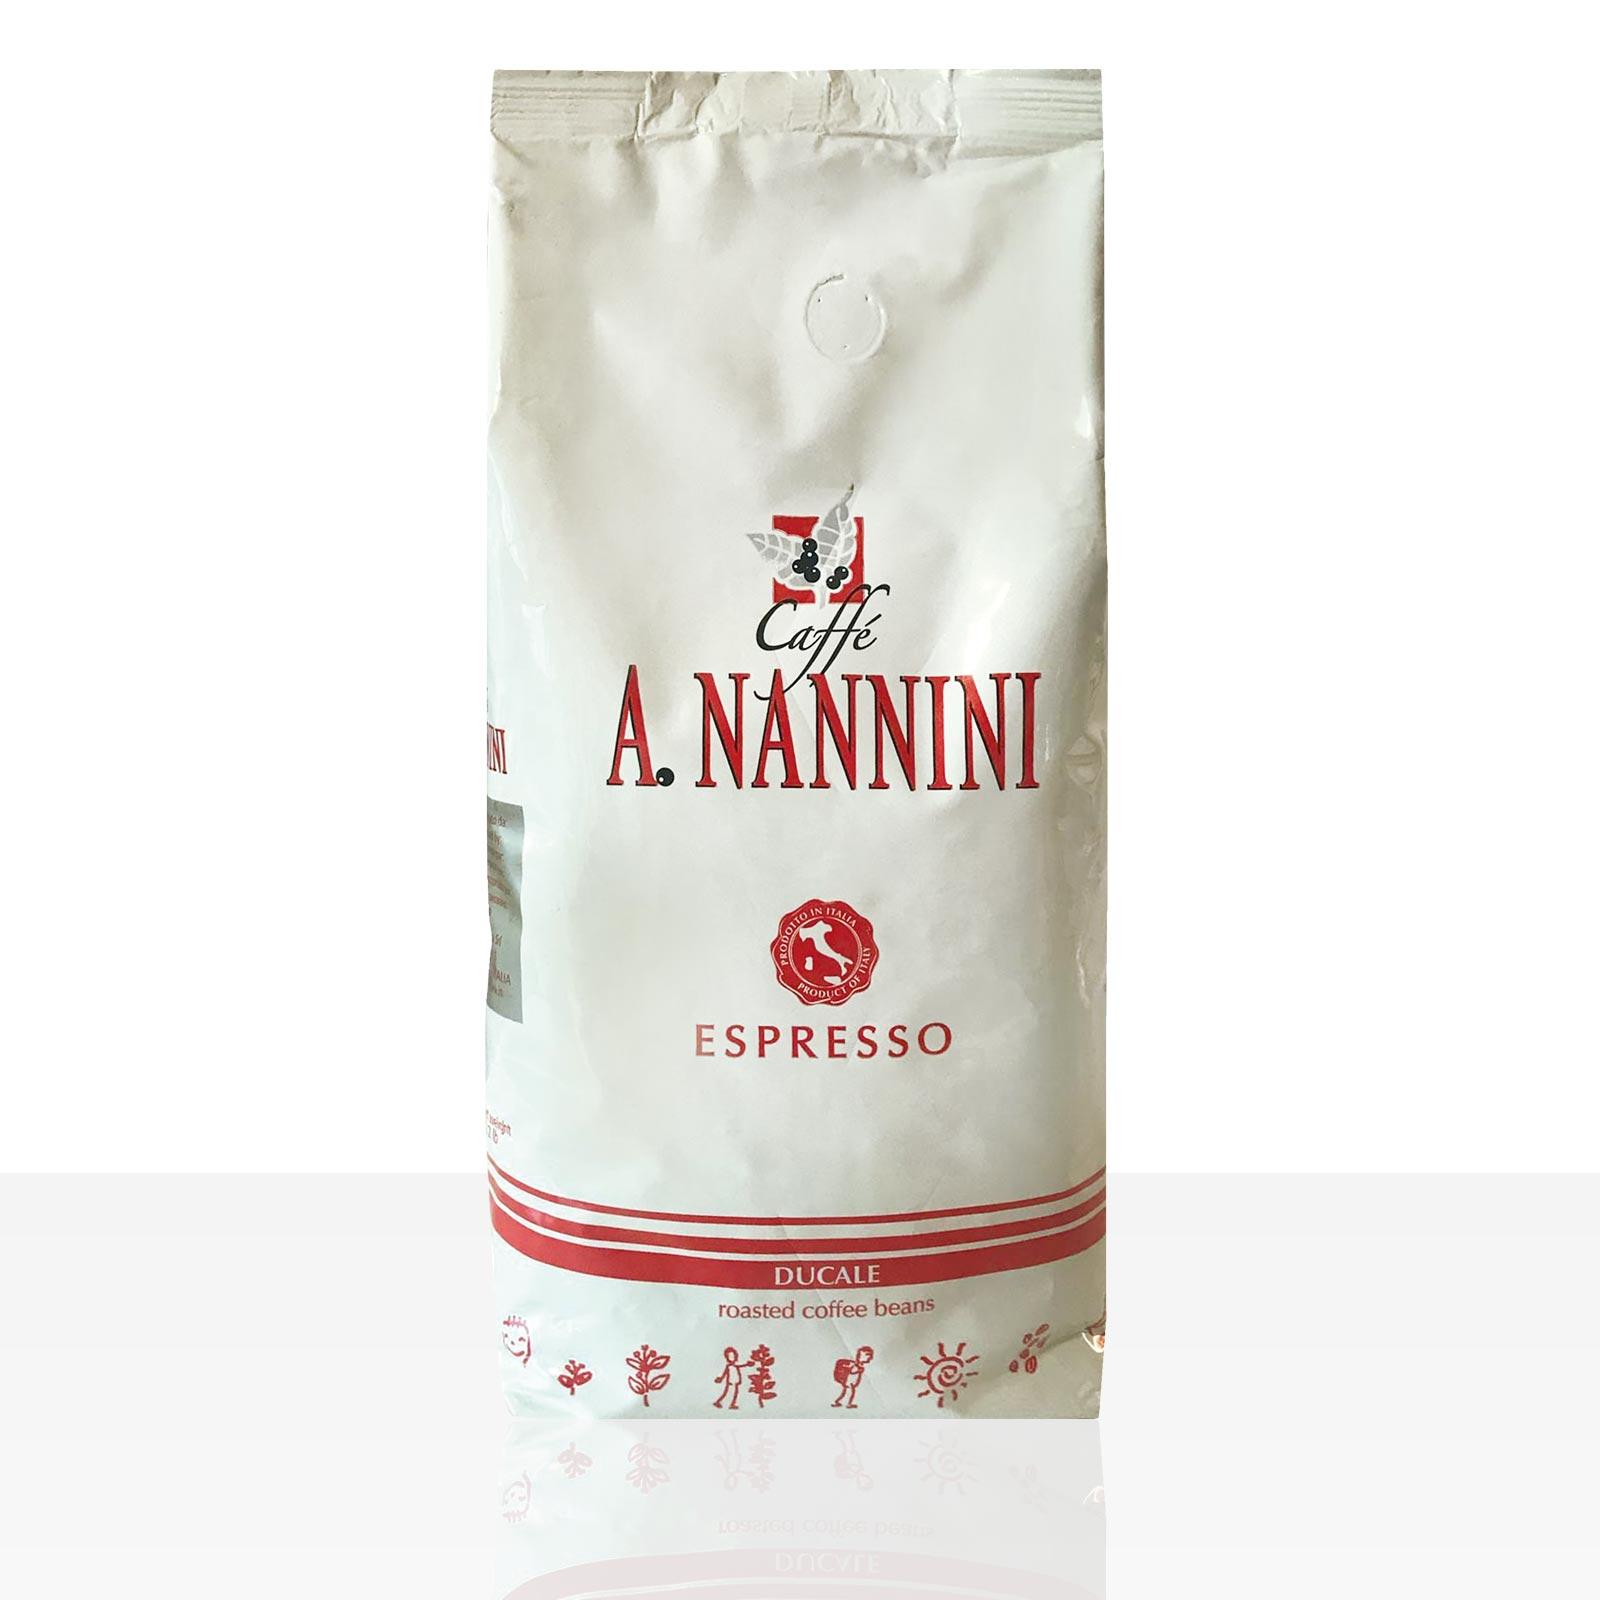 Nannini Espresso Ducale 1kg Kaffee ganze Bohne